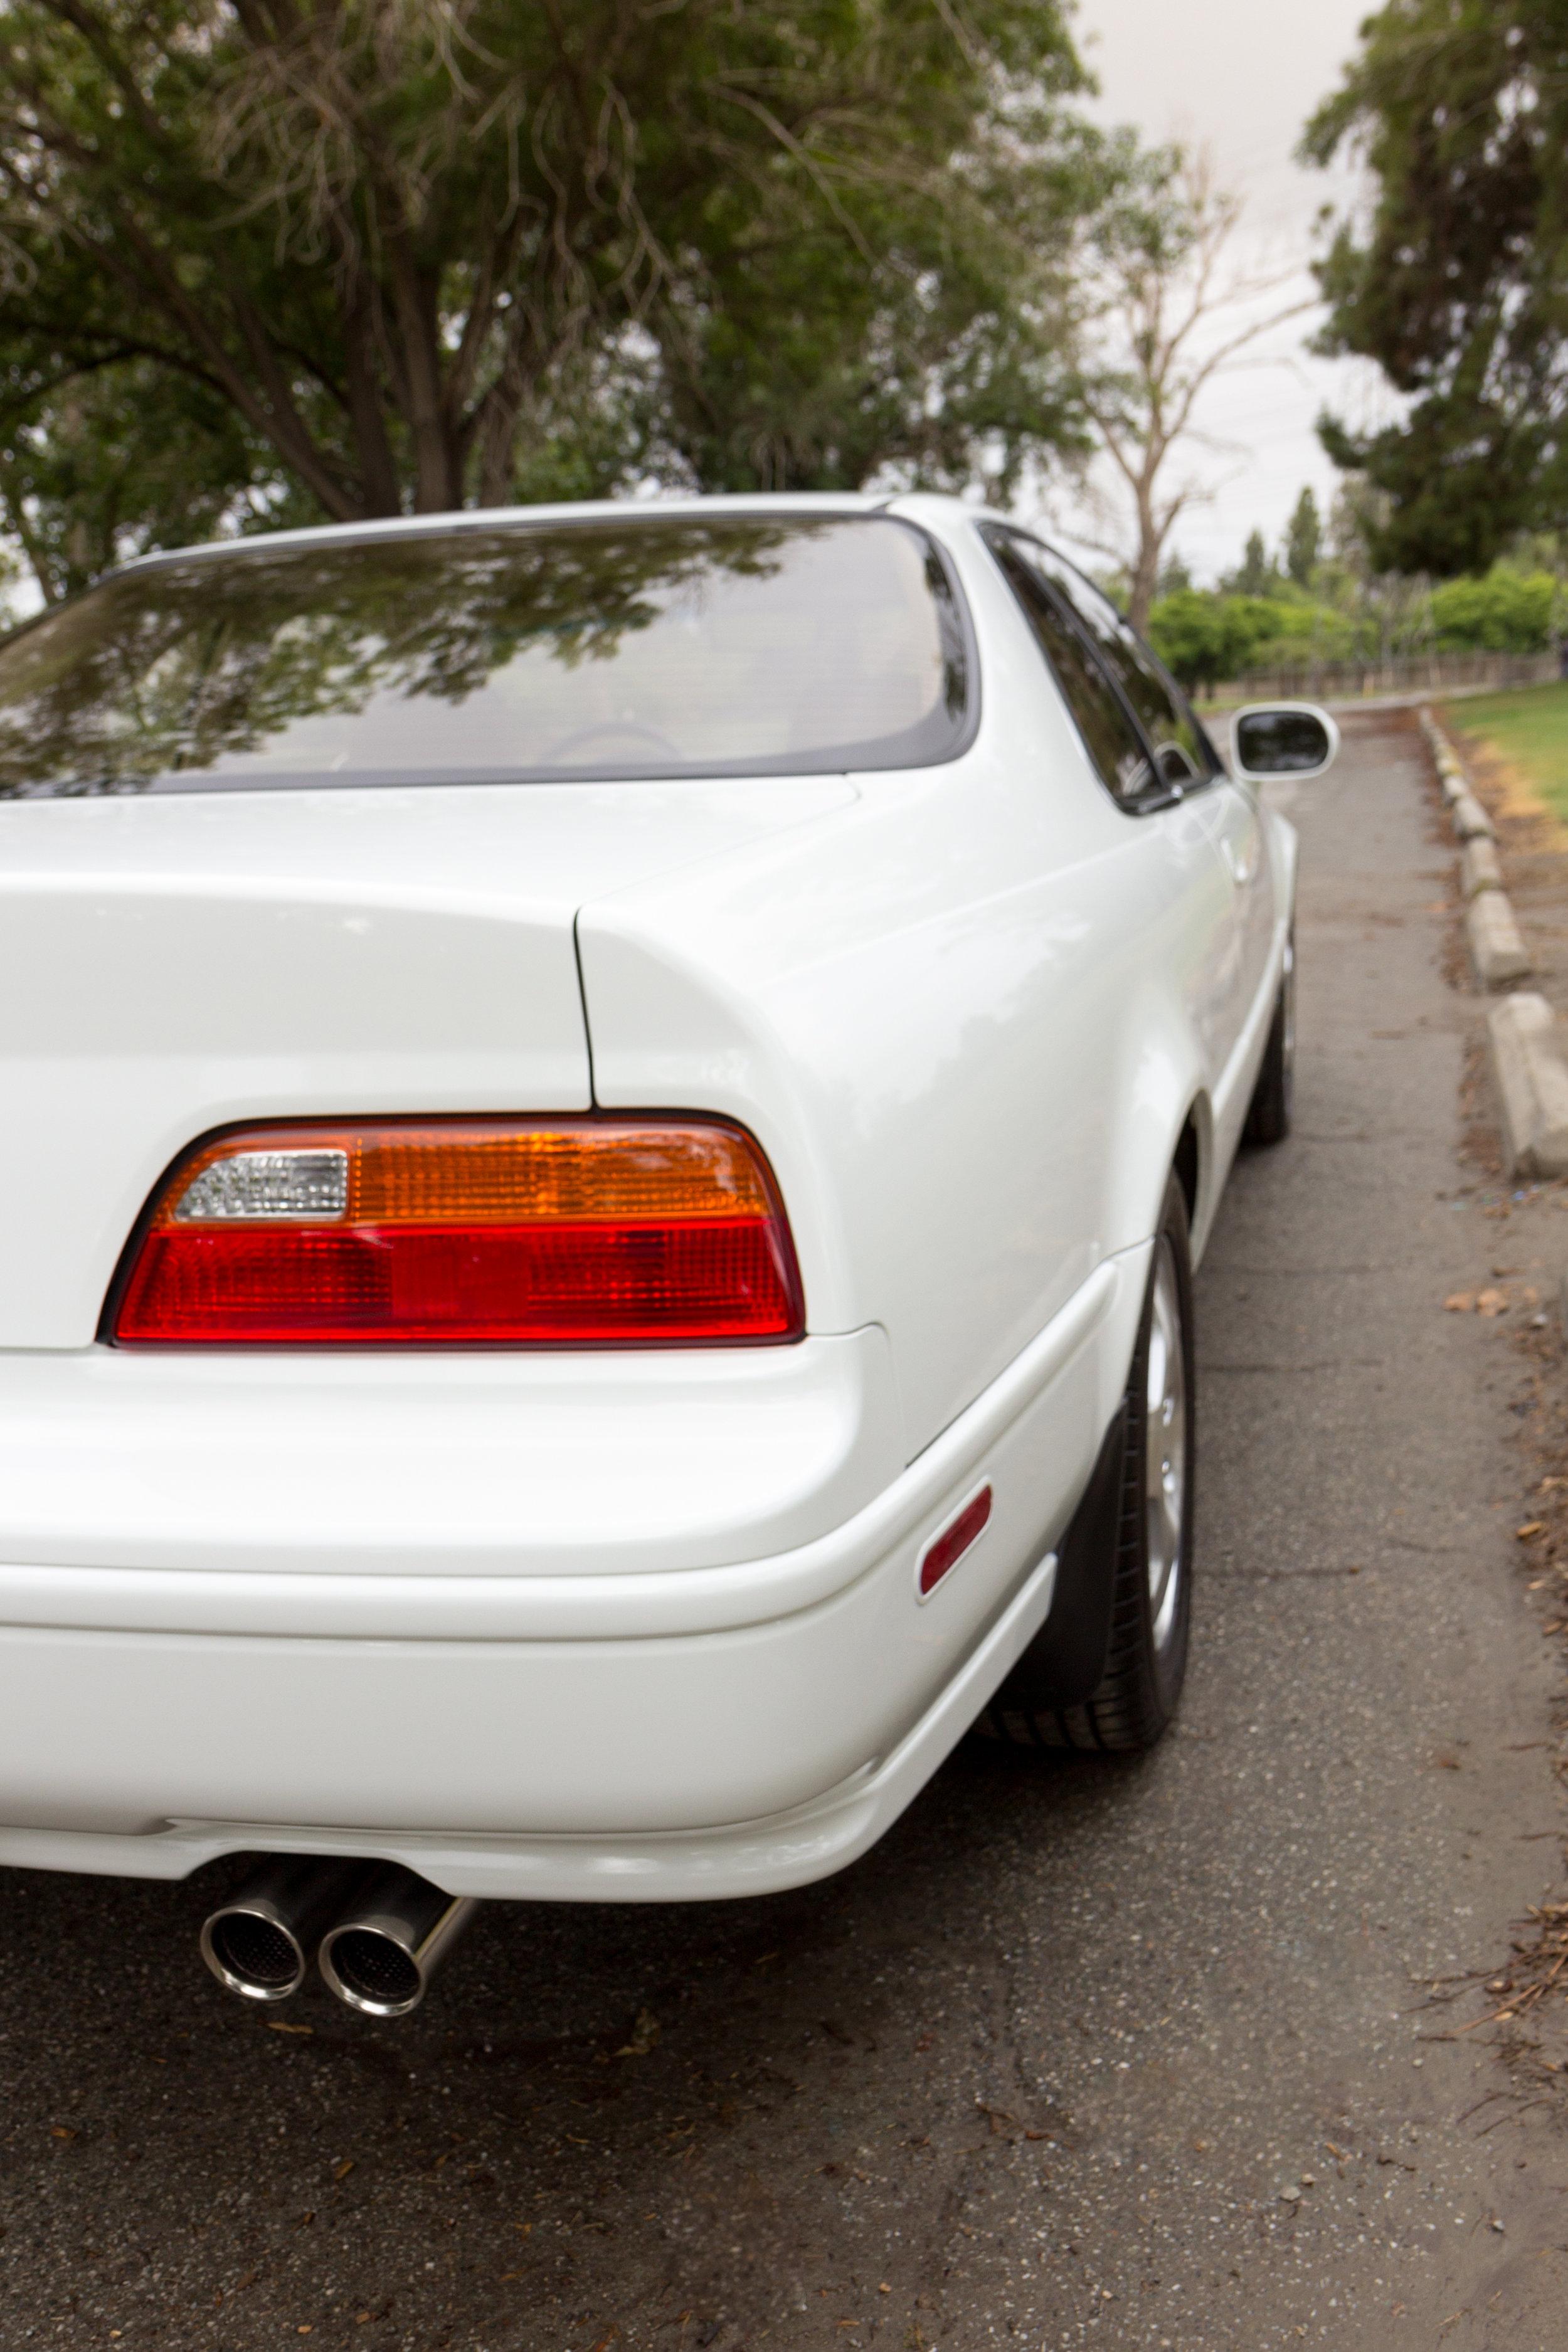 1994 Acura Legend Coupe-44.JPG